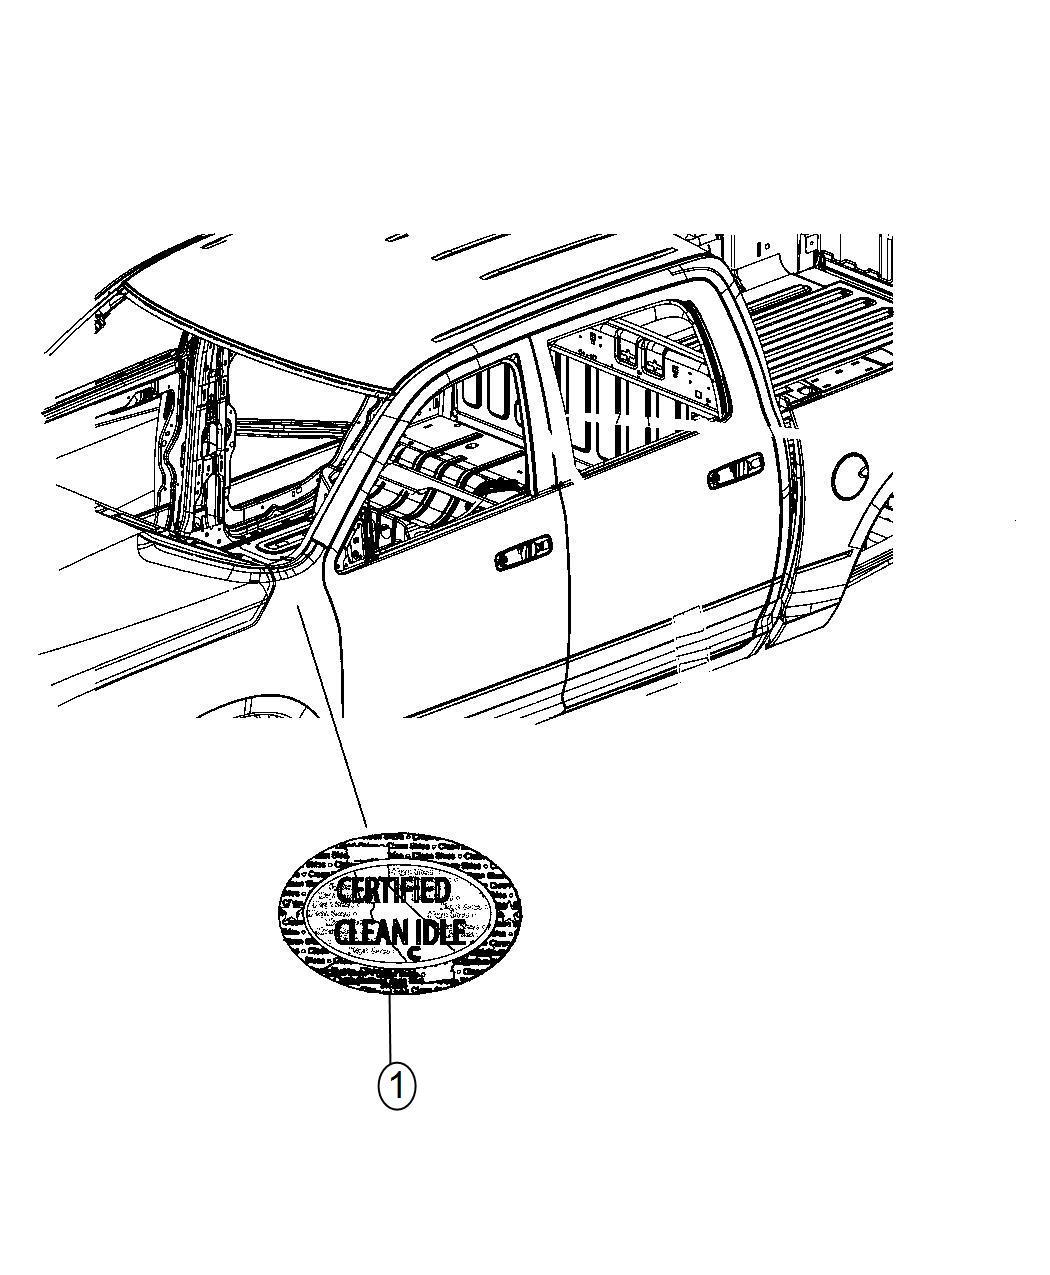 Ram Label Clean Idle Emissions 3 7l V6 Gas